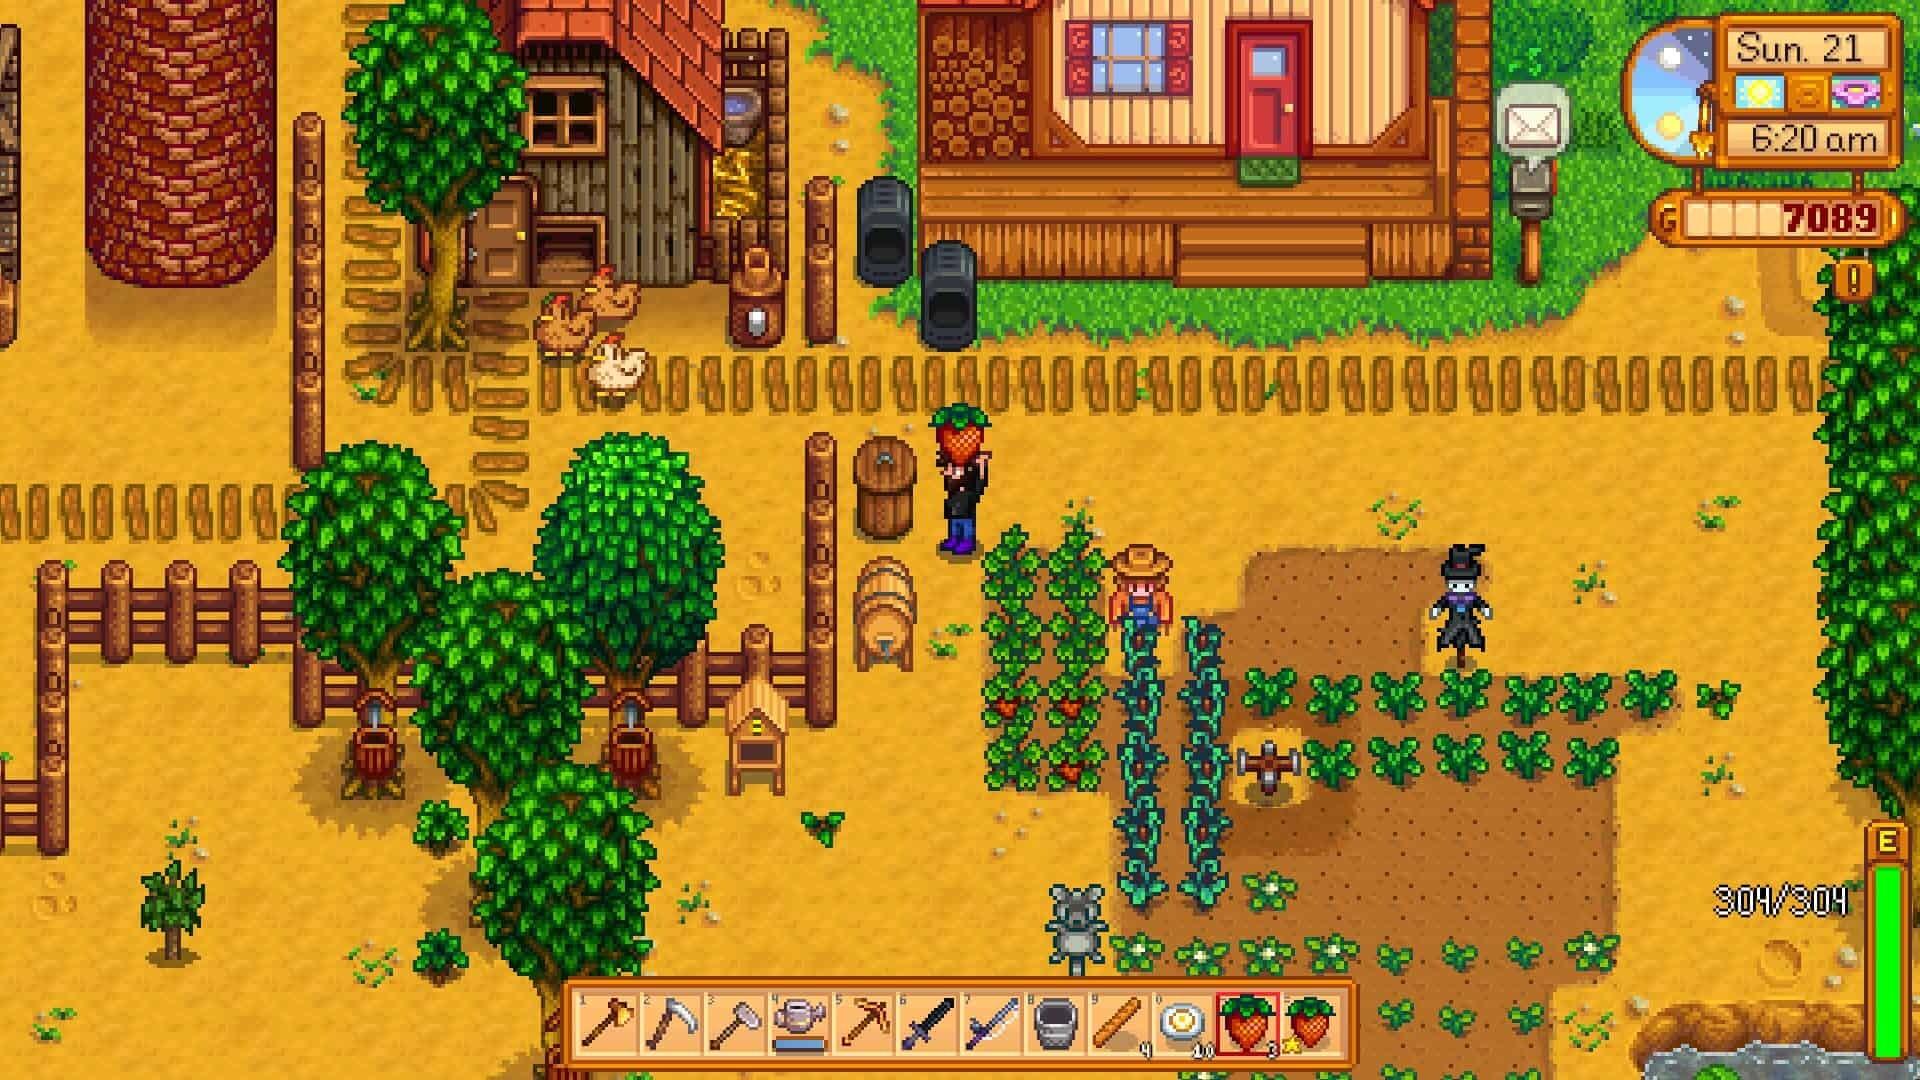 Stardew Valley game screenshot 14